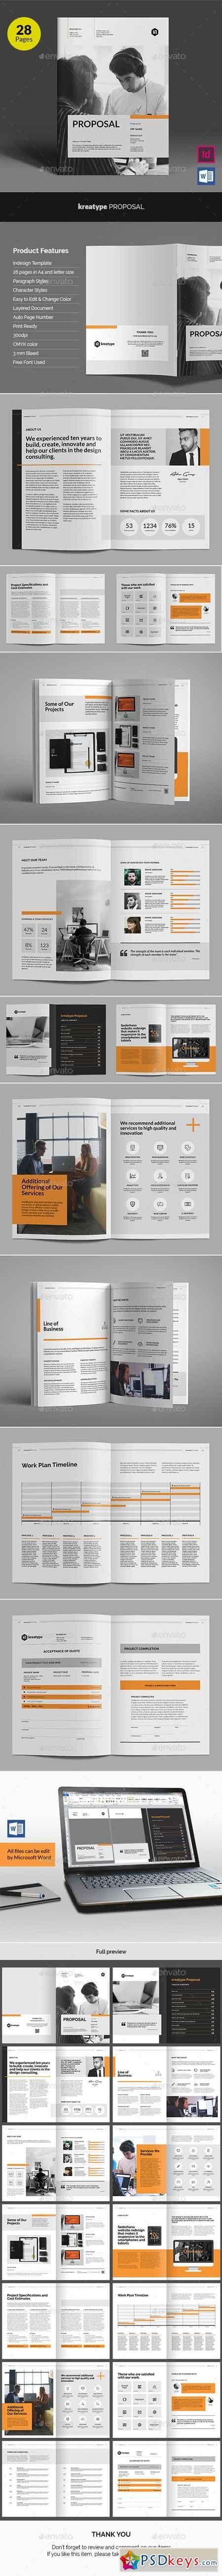 Kreatype Business Proposal v04 19296720